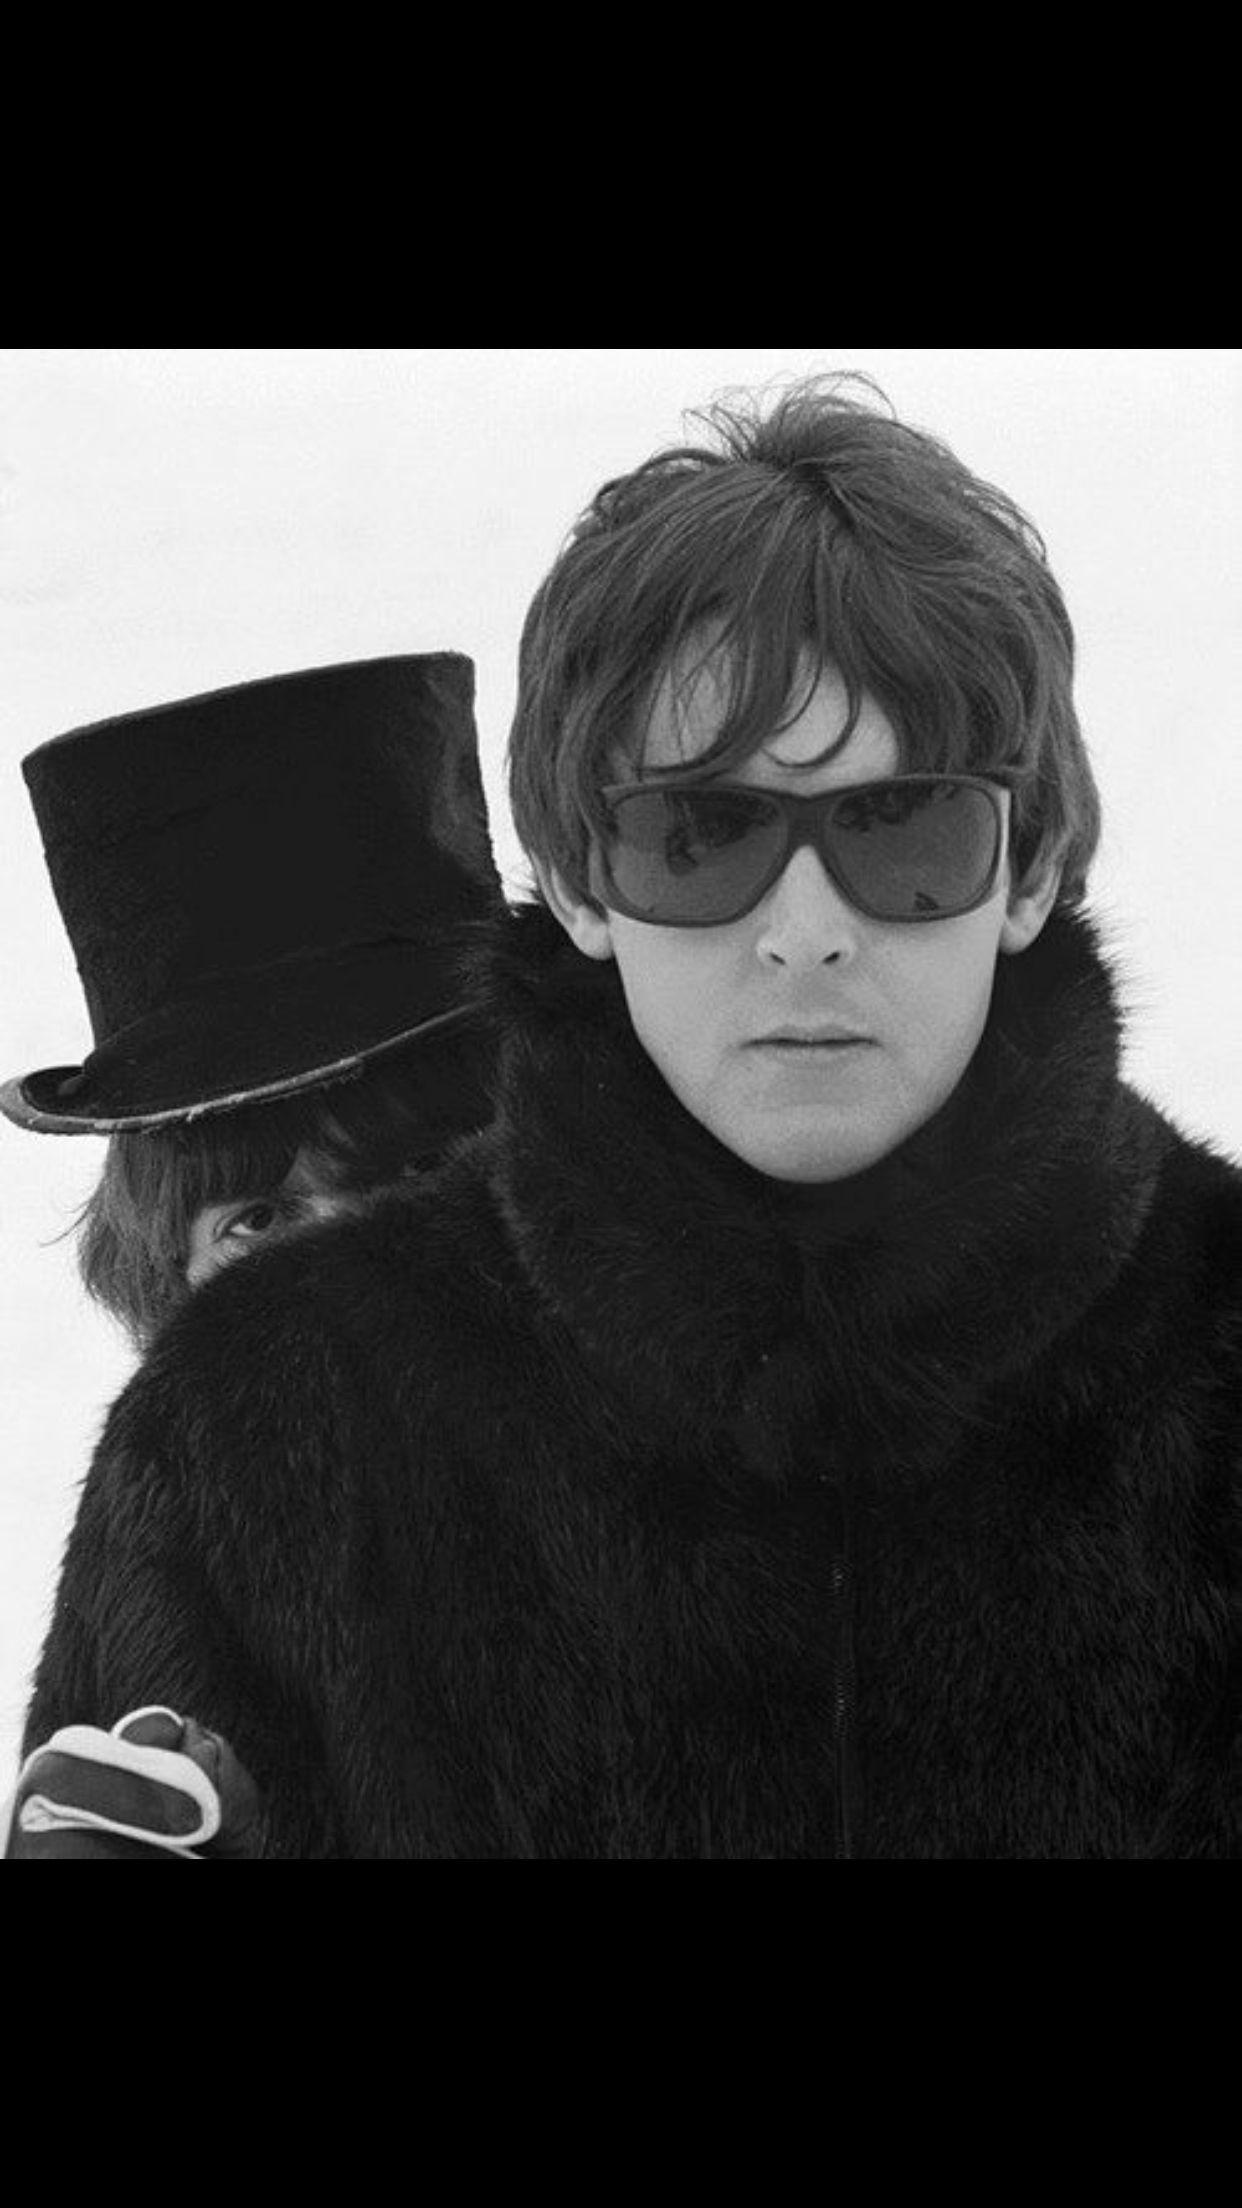 George photo bombing Paul